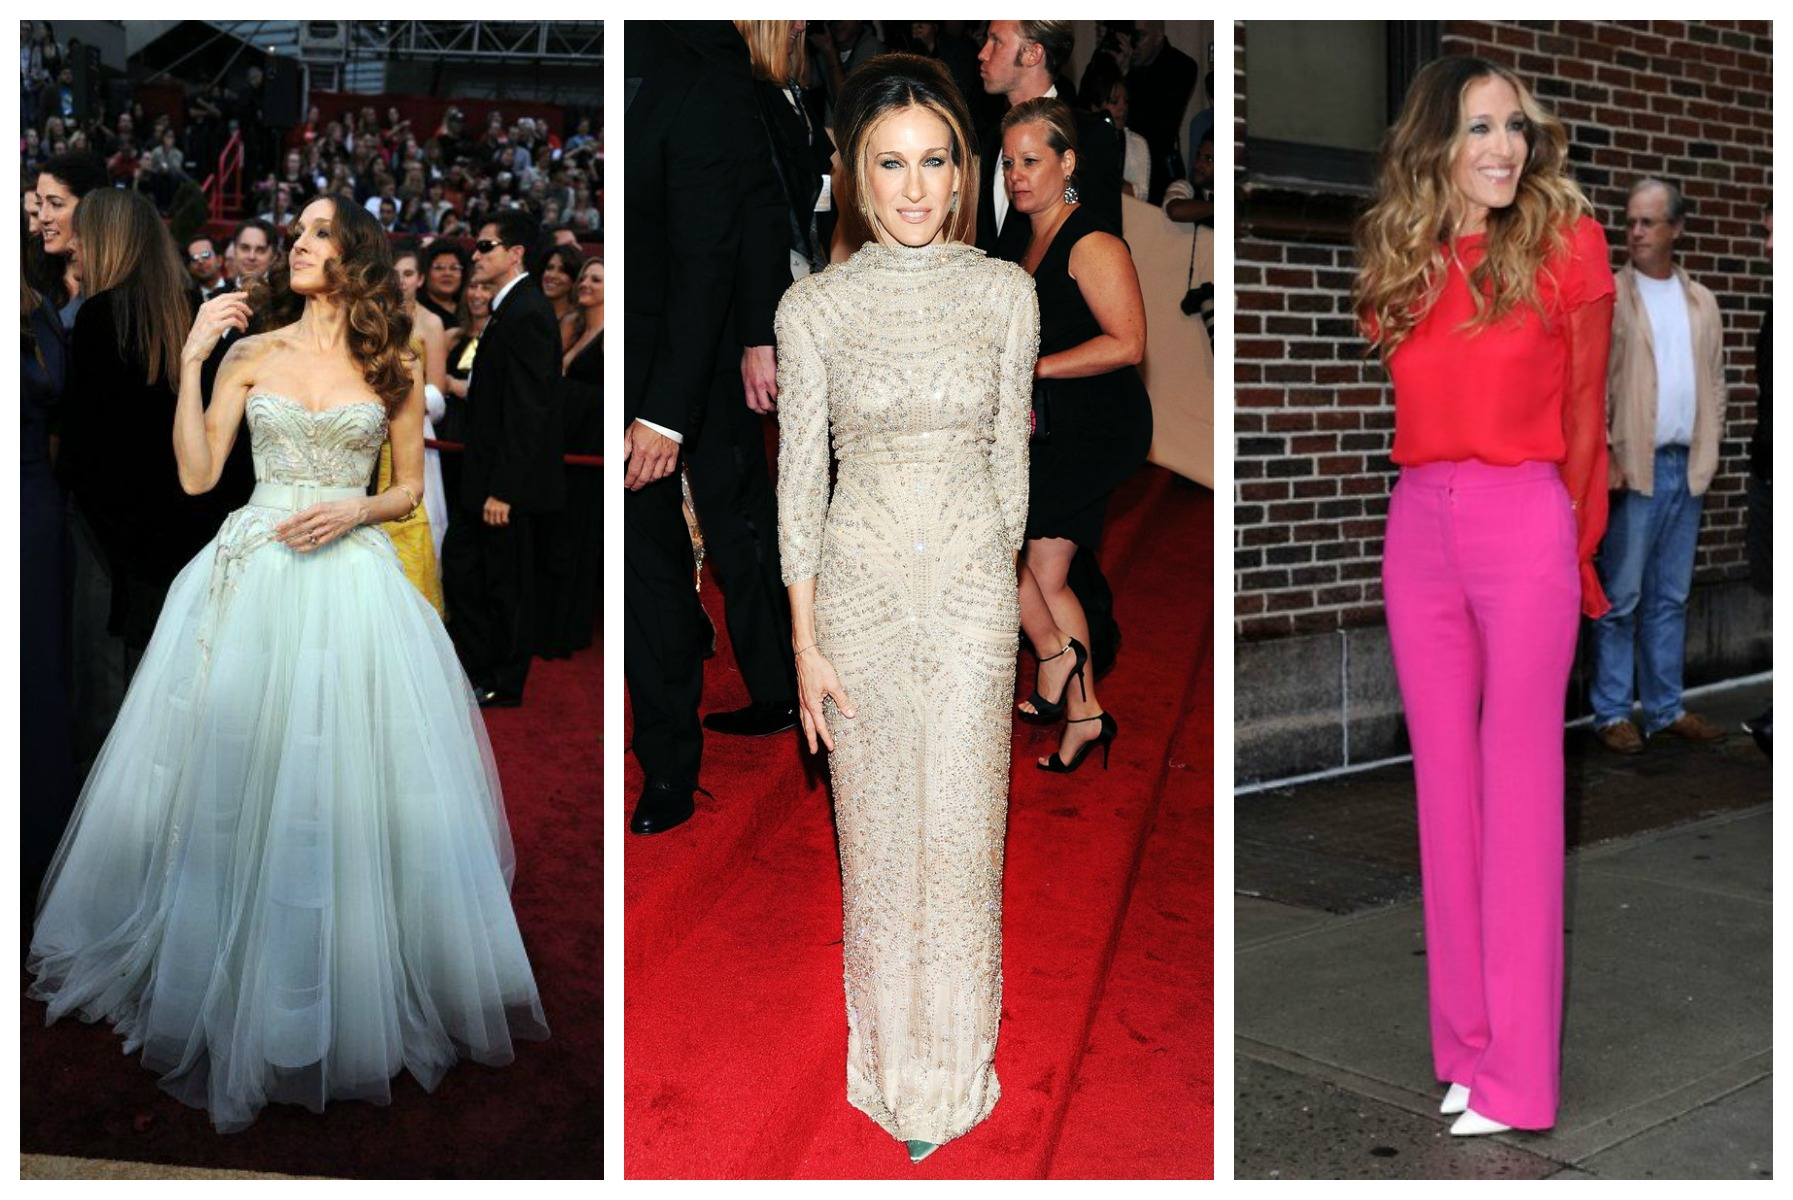 vith.es consultoria de moda estilo outfit sarah jessica parker style looks sex and the city antonio pozuelo (6)